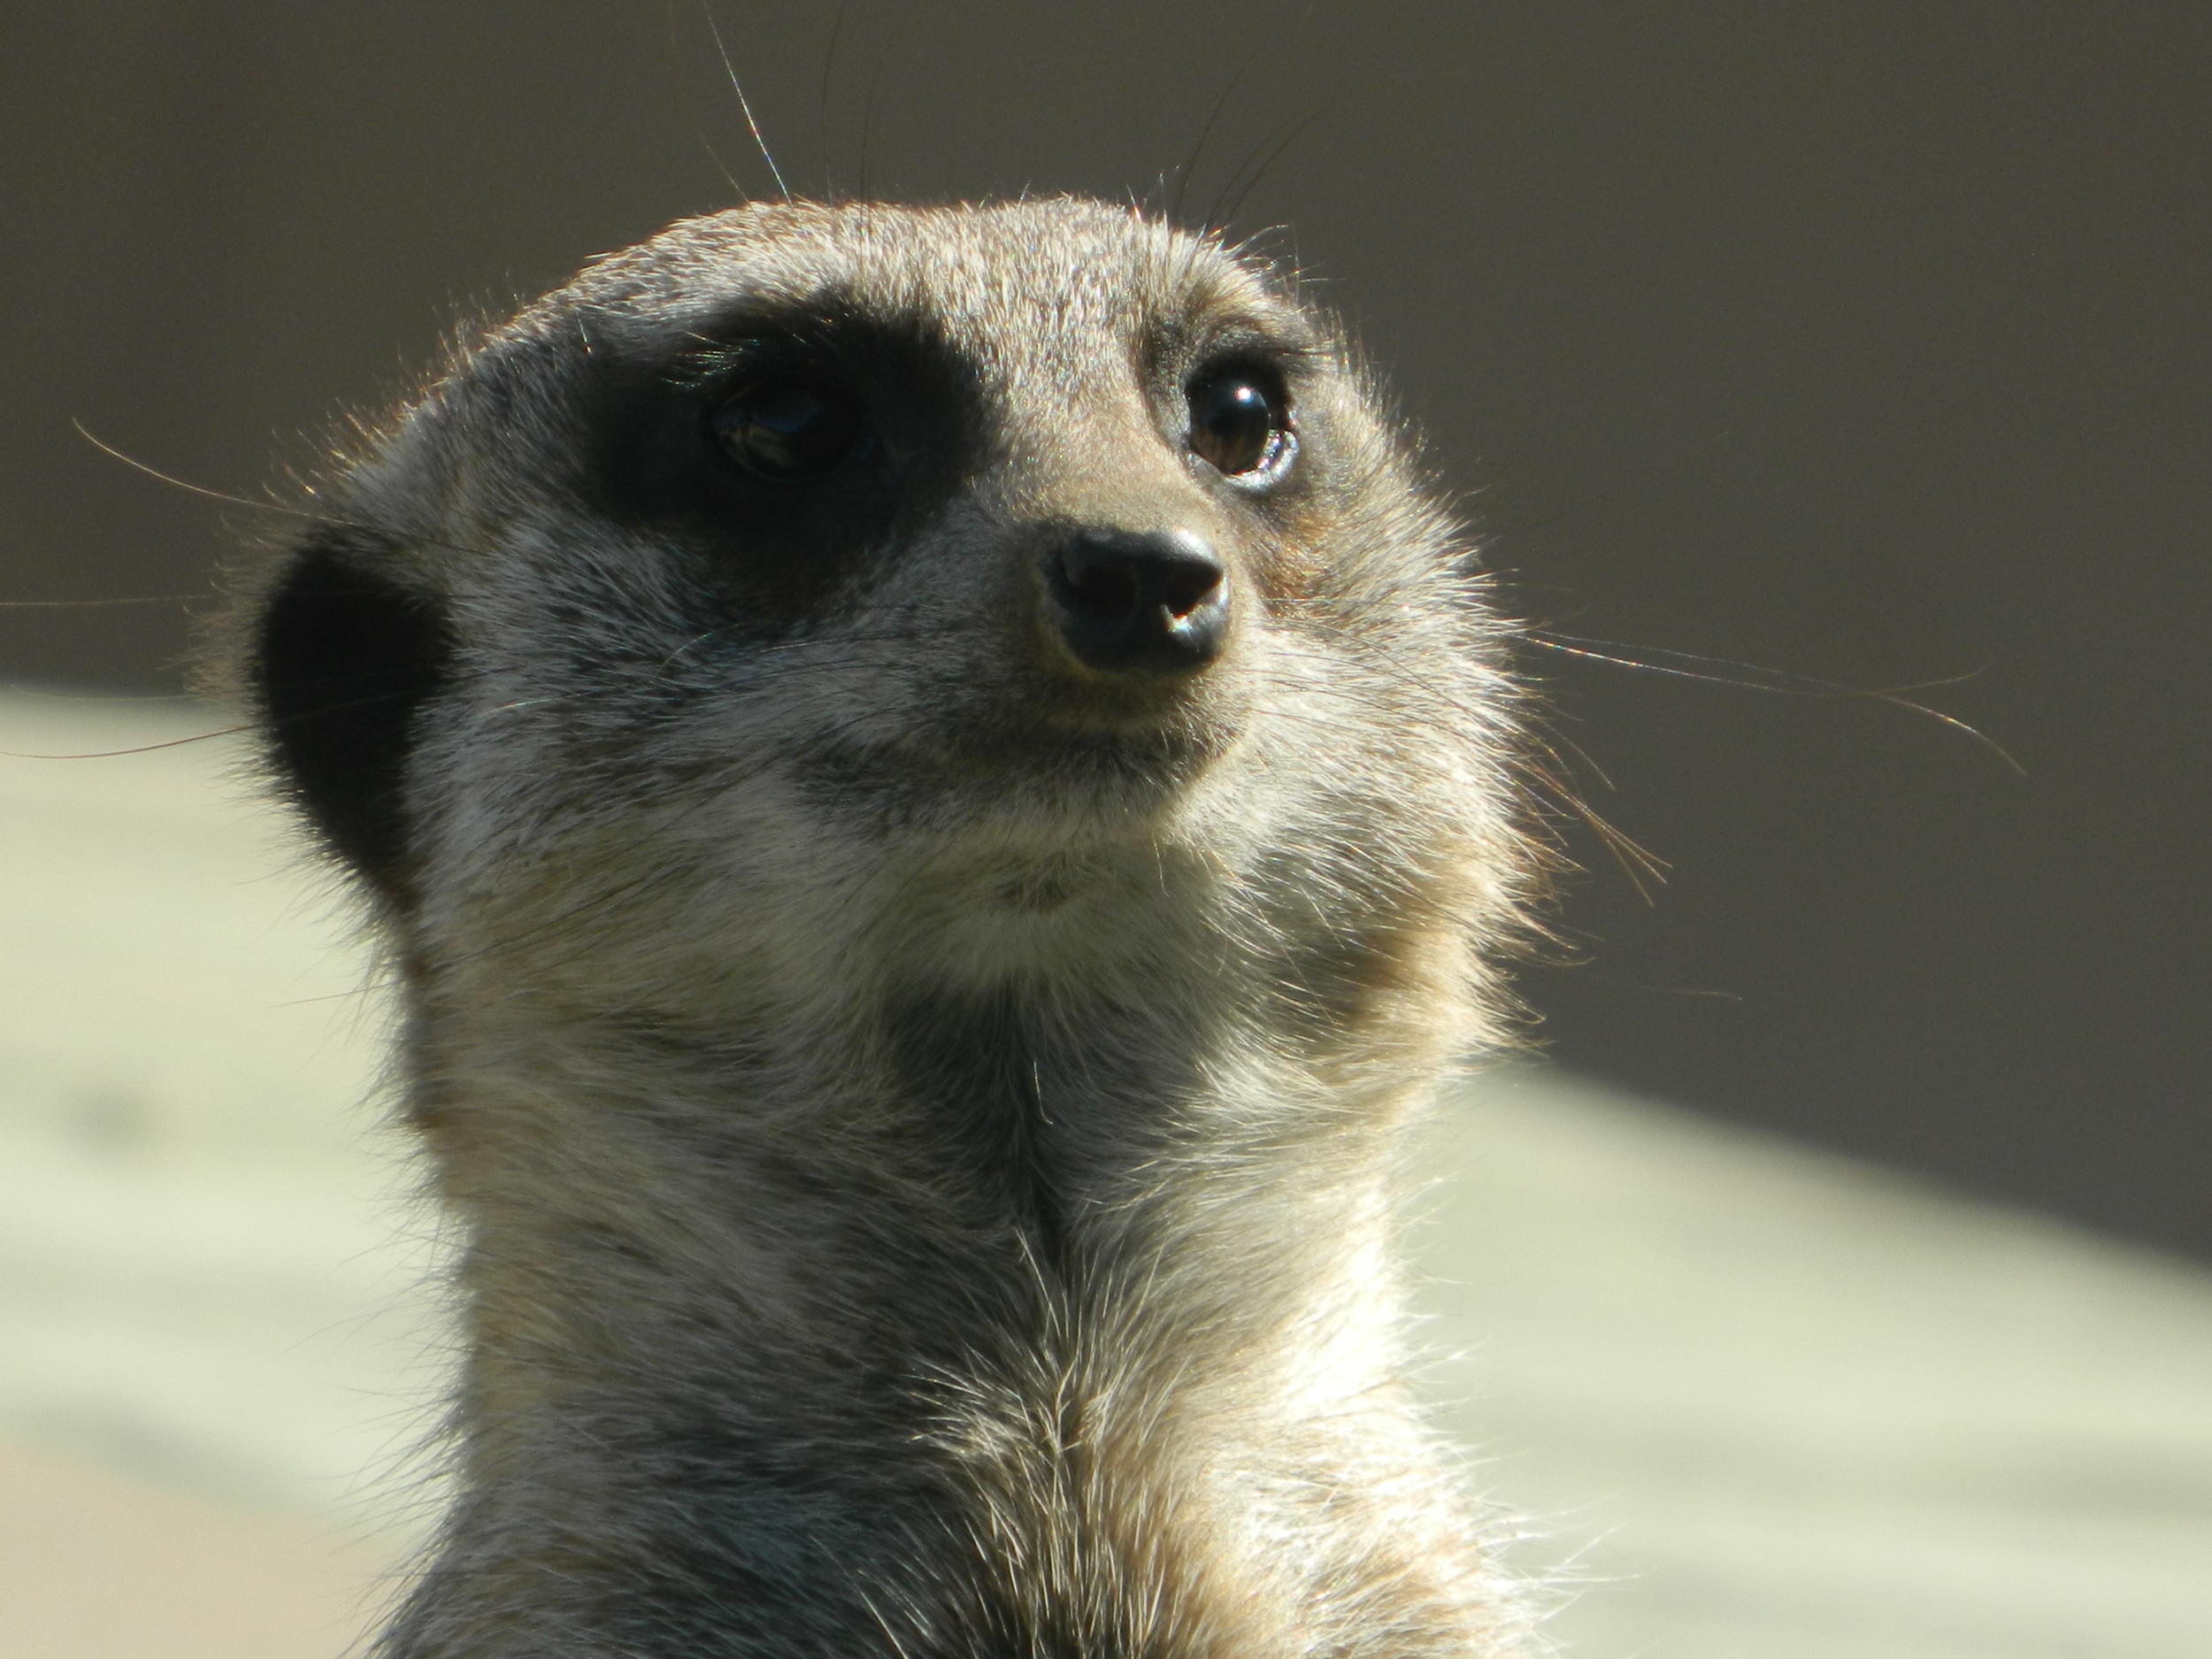 Cheeky little meerkat.